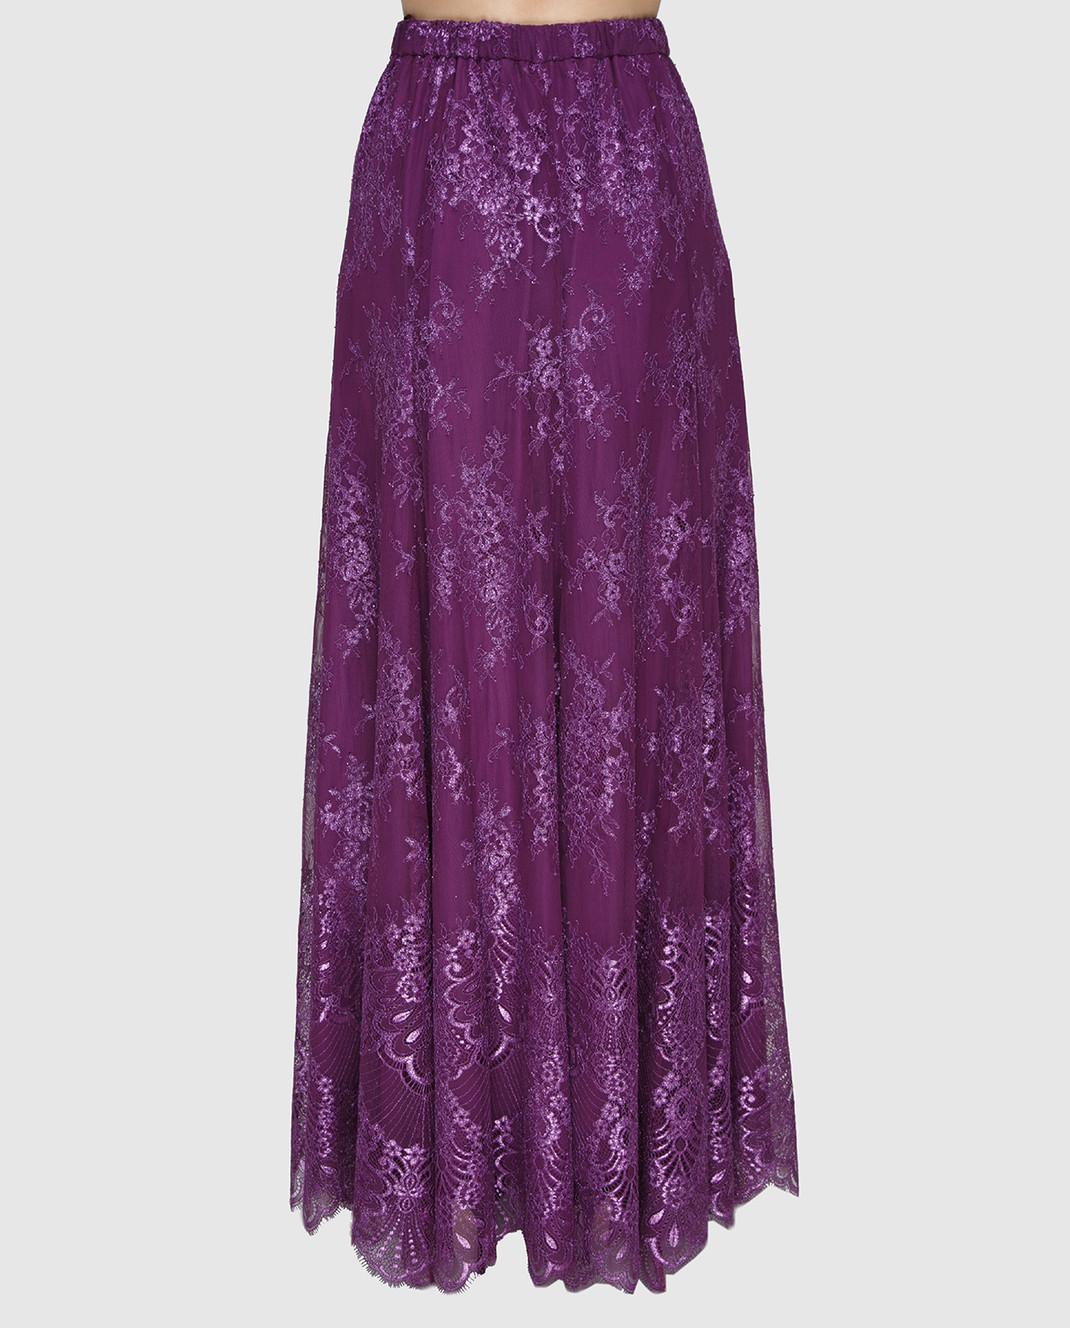 Philosophy di Lorenzo Serafini Фиолетовая юбка A0117 изображение 4